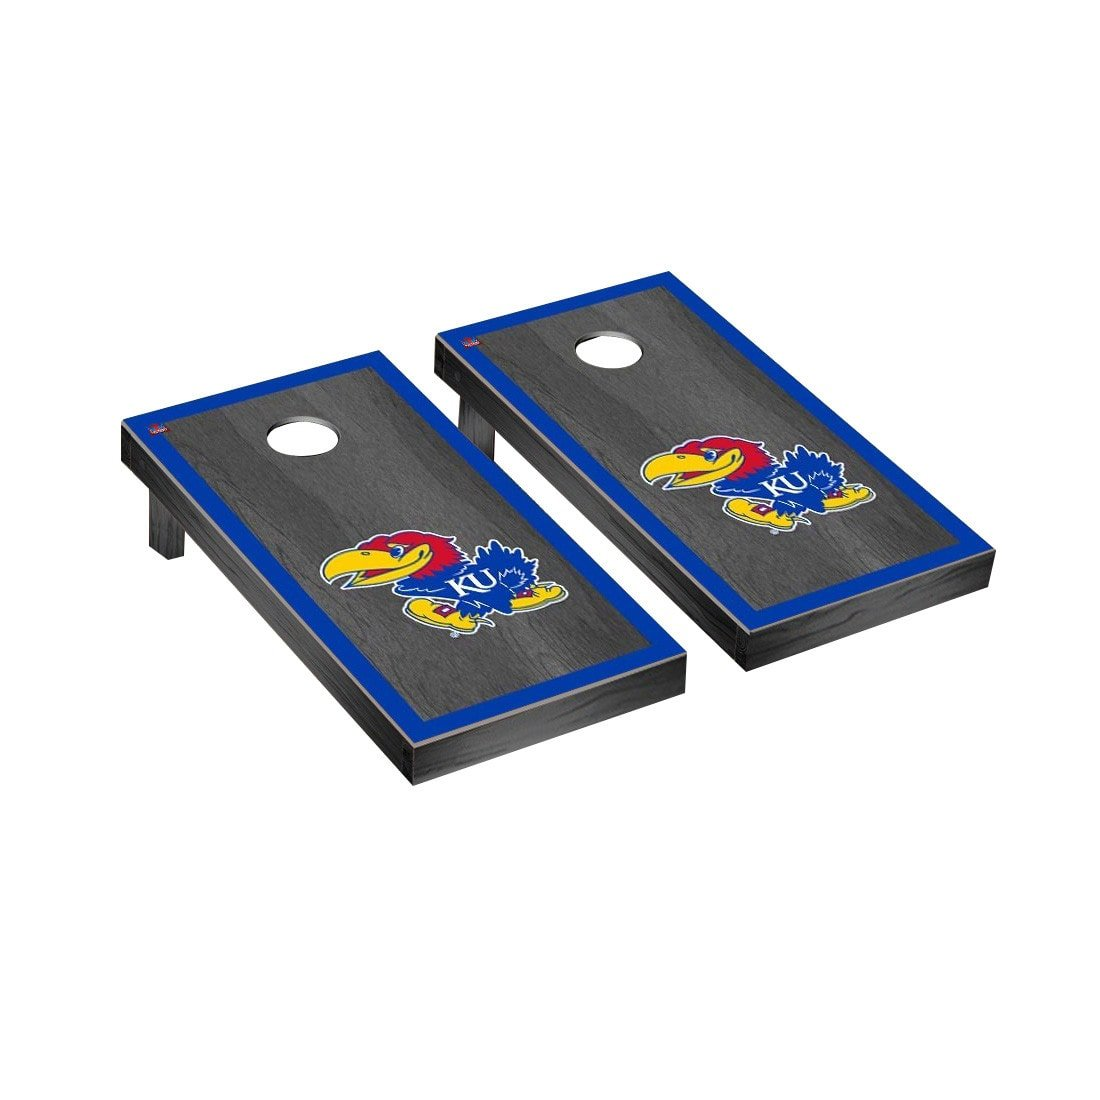 Victory Tailgate Kansas KU Jayhawks Regulation Cornhole Game Set Onyx Stained Border Version